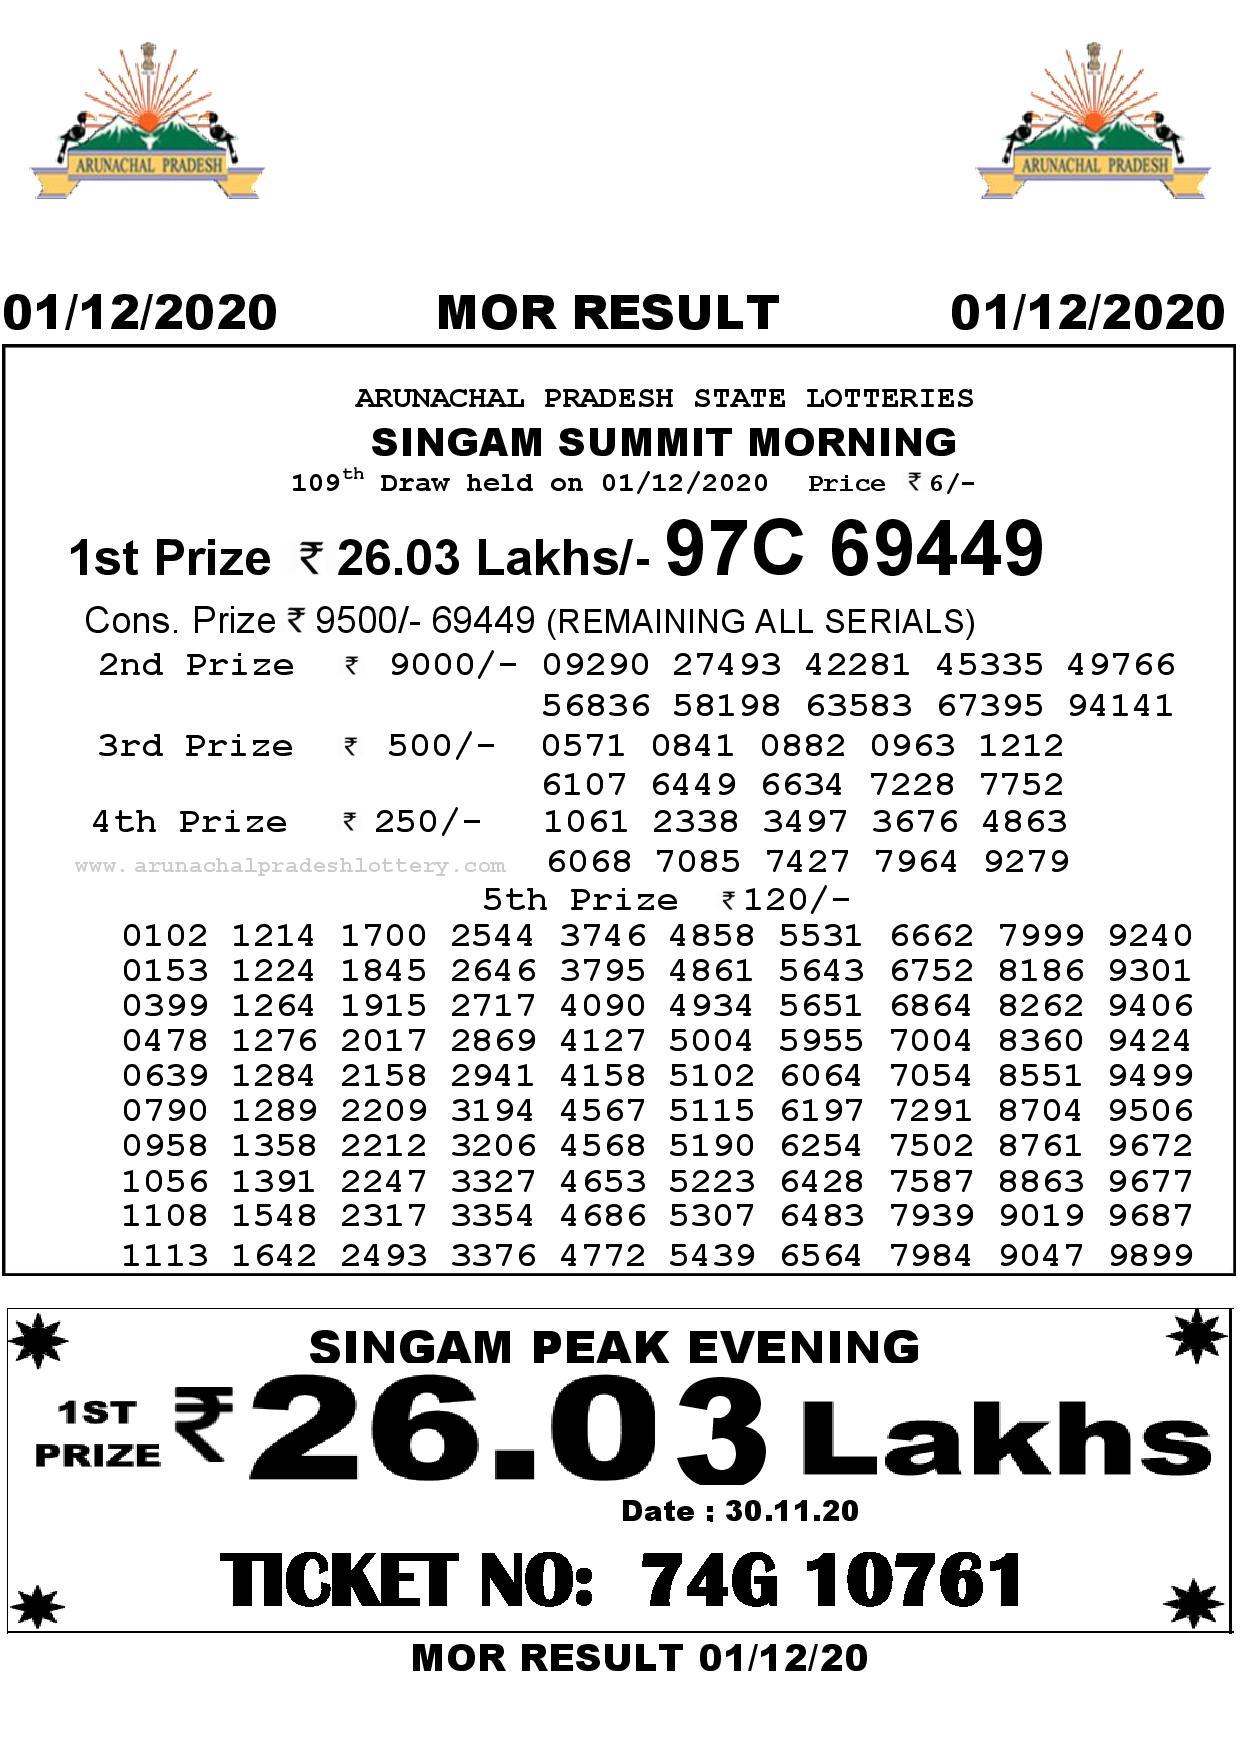 arunachal pradesh lottery result today live